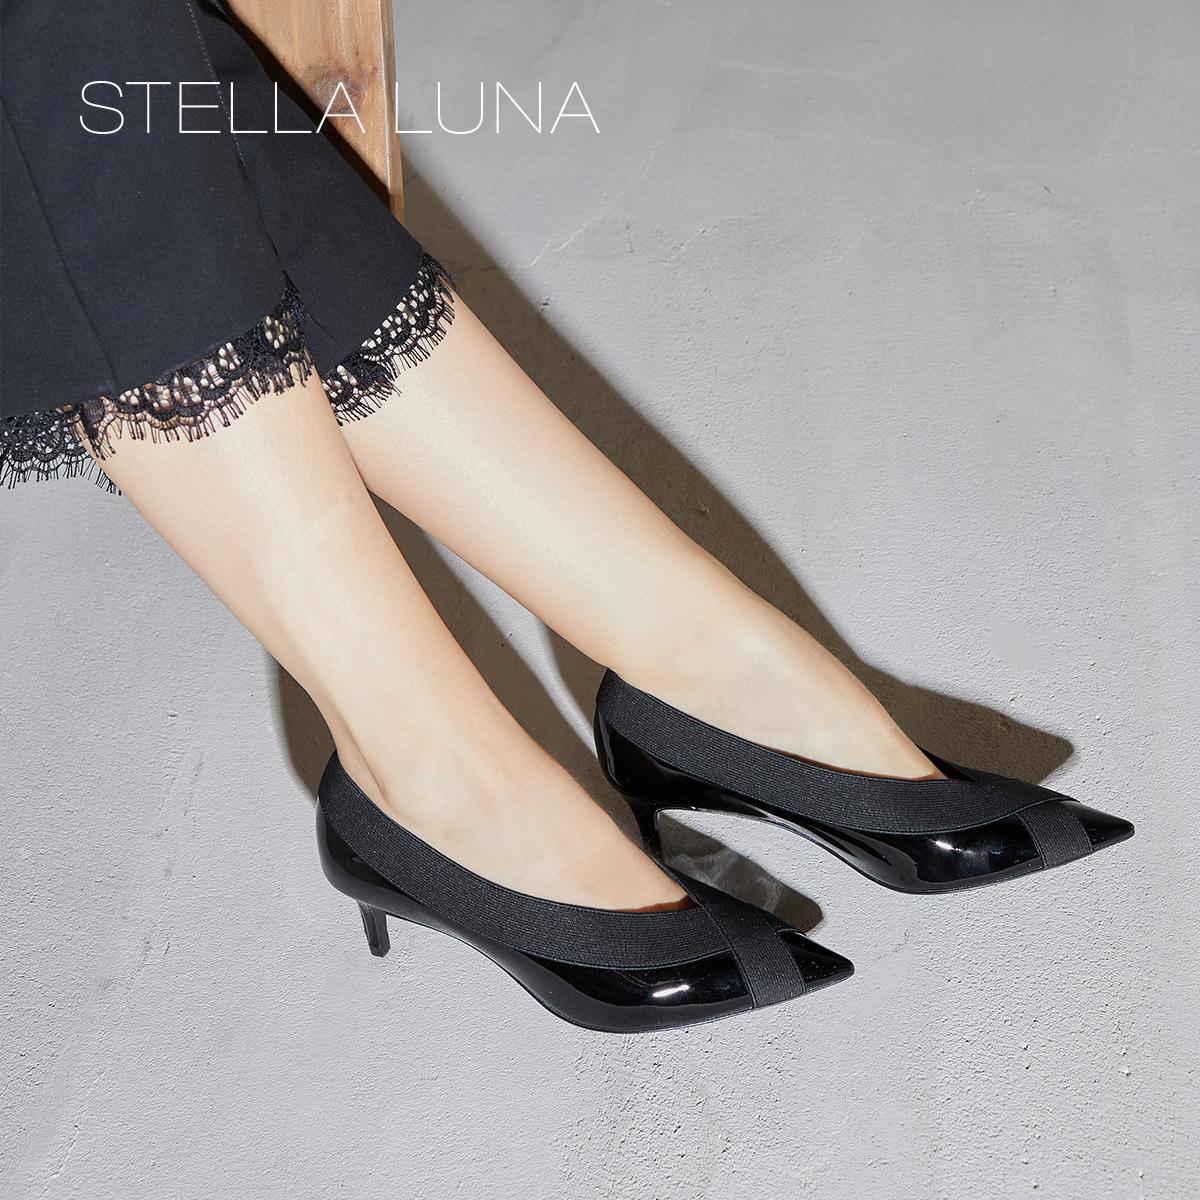 STELLA LUNA2018秋季新款牛皮浅口时尚尖头细跟小猫跟通勤女单鞋